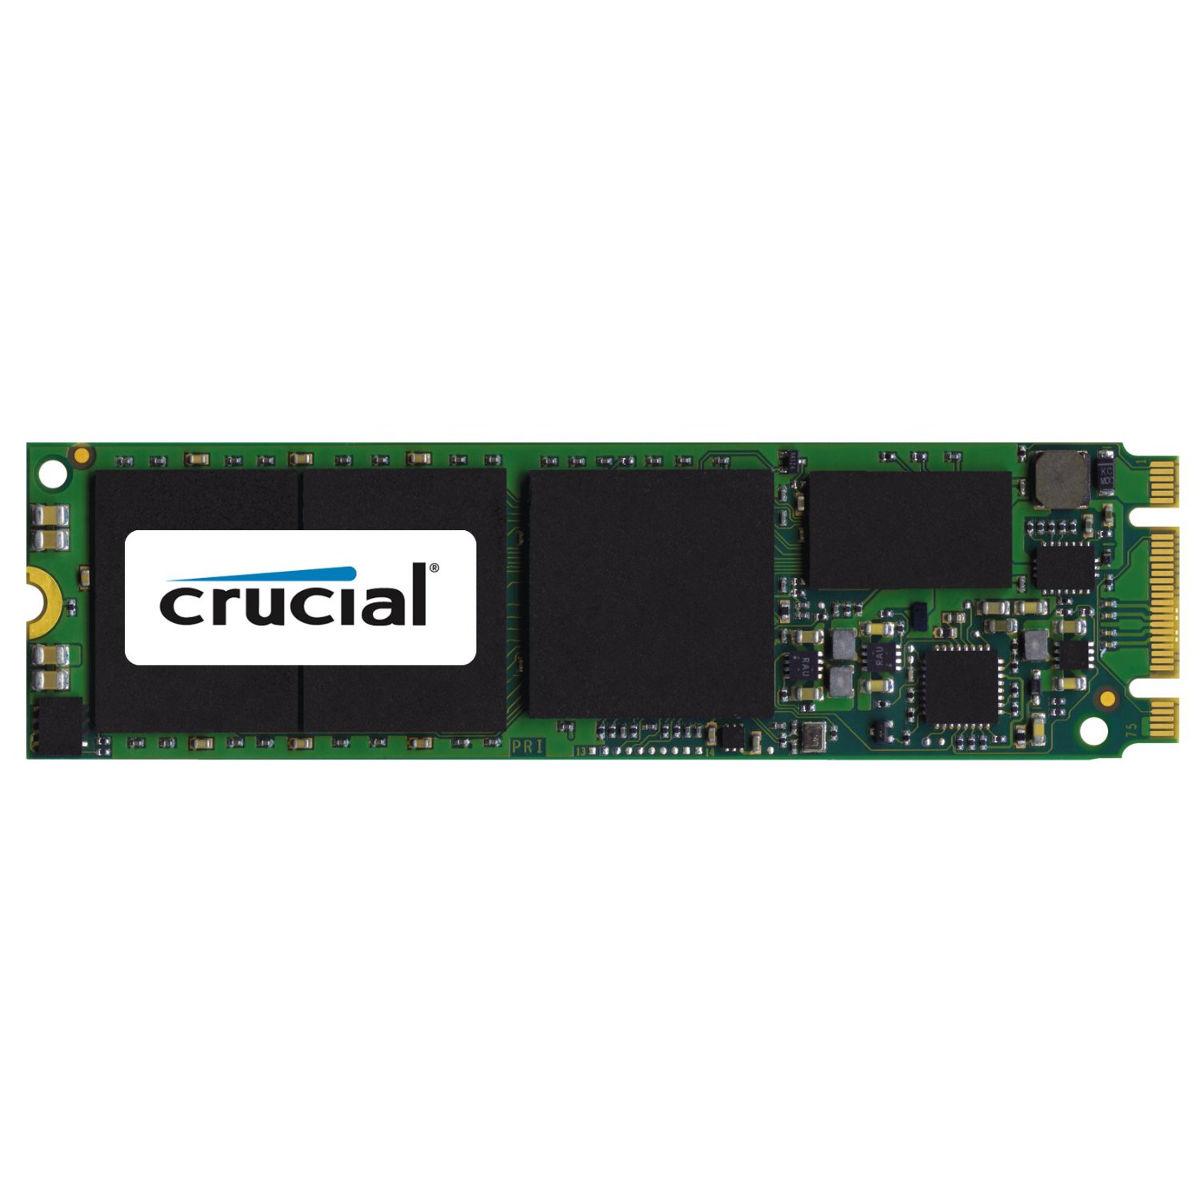 Disque SSD Crucial M500 M.2 120 Go SSD 120 Go M.2 (Serial ATA 6Gb/s)